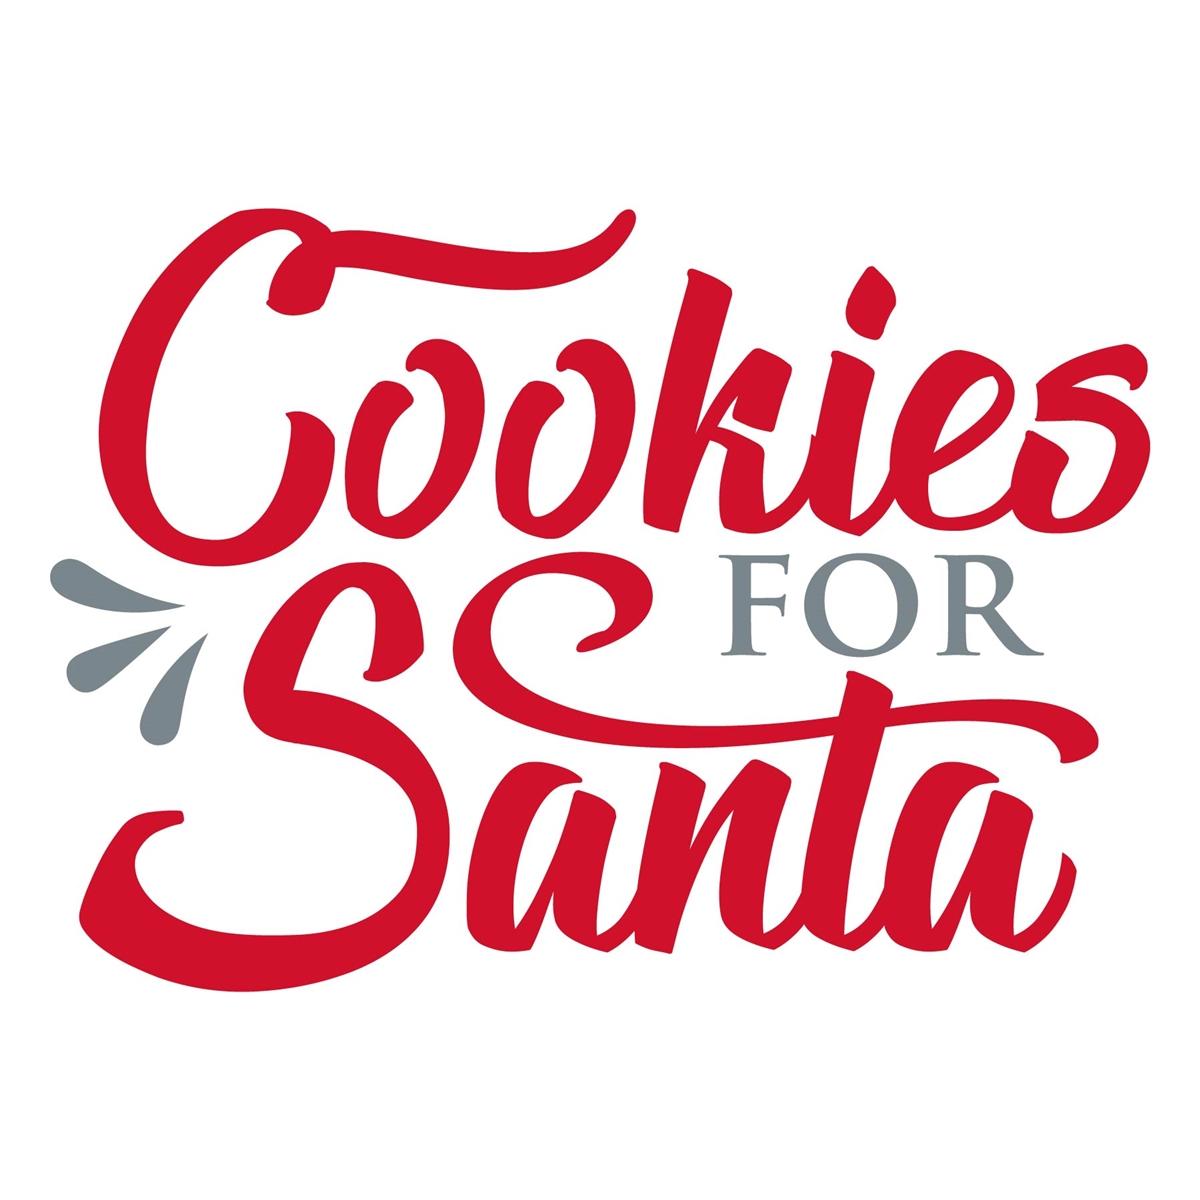 cookies for santa svg #42, Download drawings